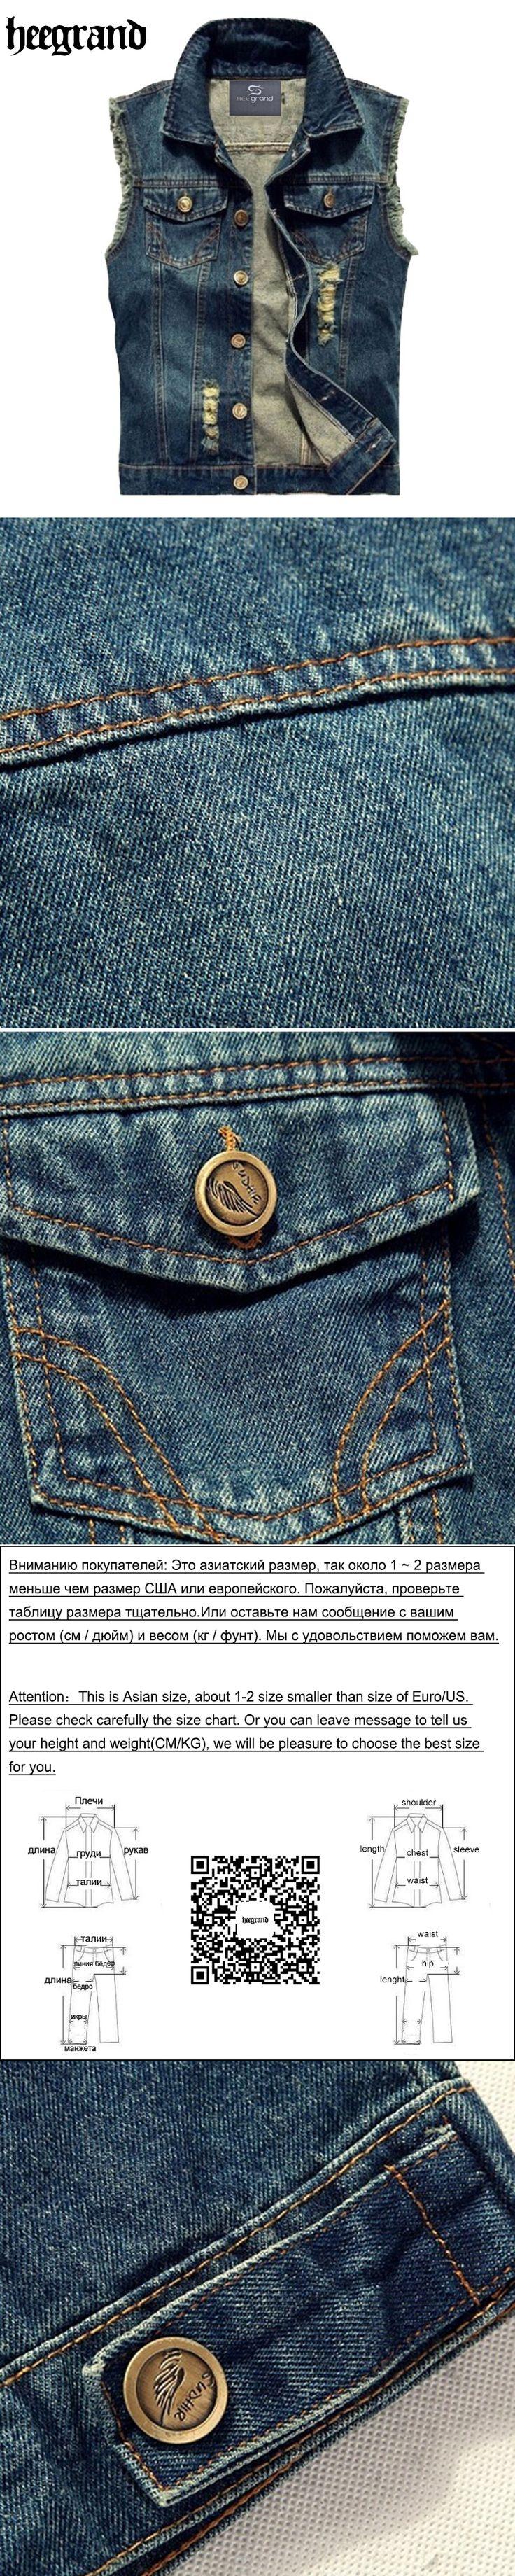 HEE GRAND Men Jeans Vest Punk Style 2017 Spring New Fashion Sleeveless Denim Jackets  All-match Style Hip Hop Vest  MWB135